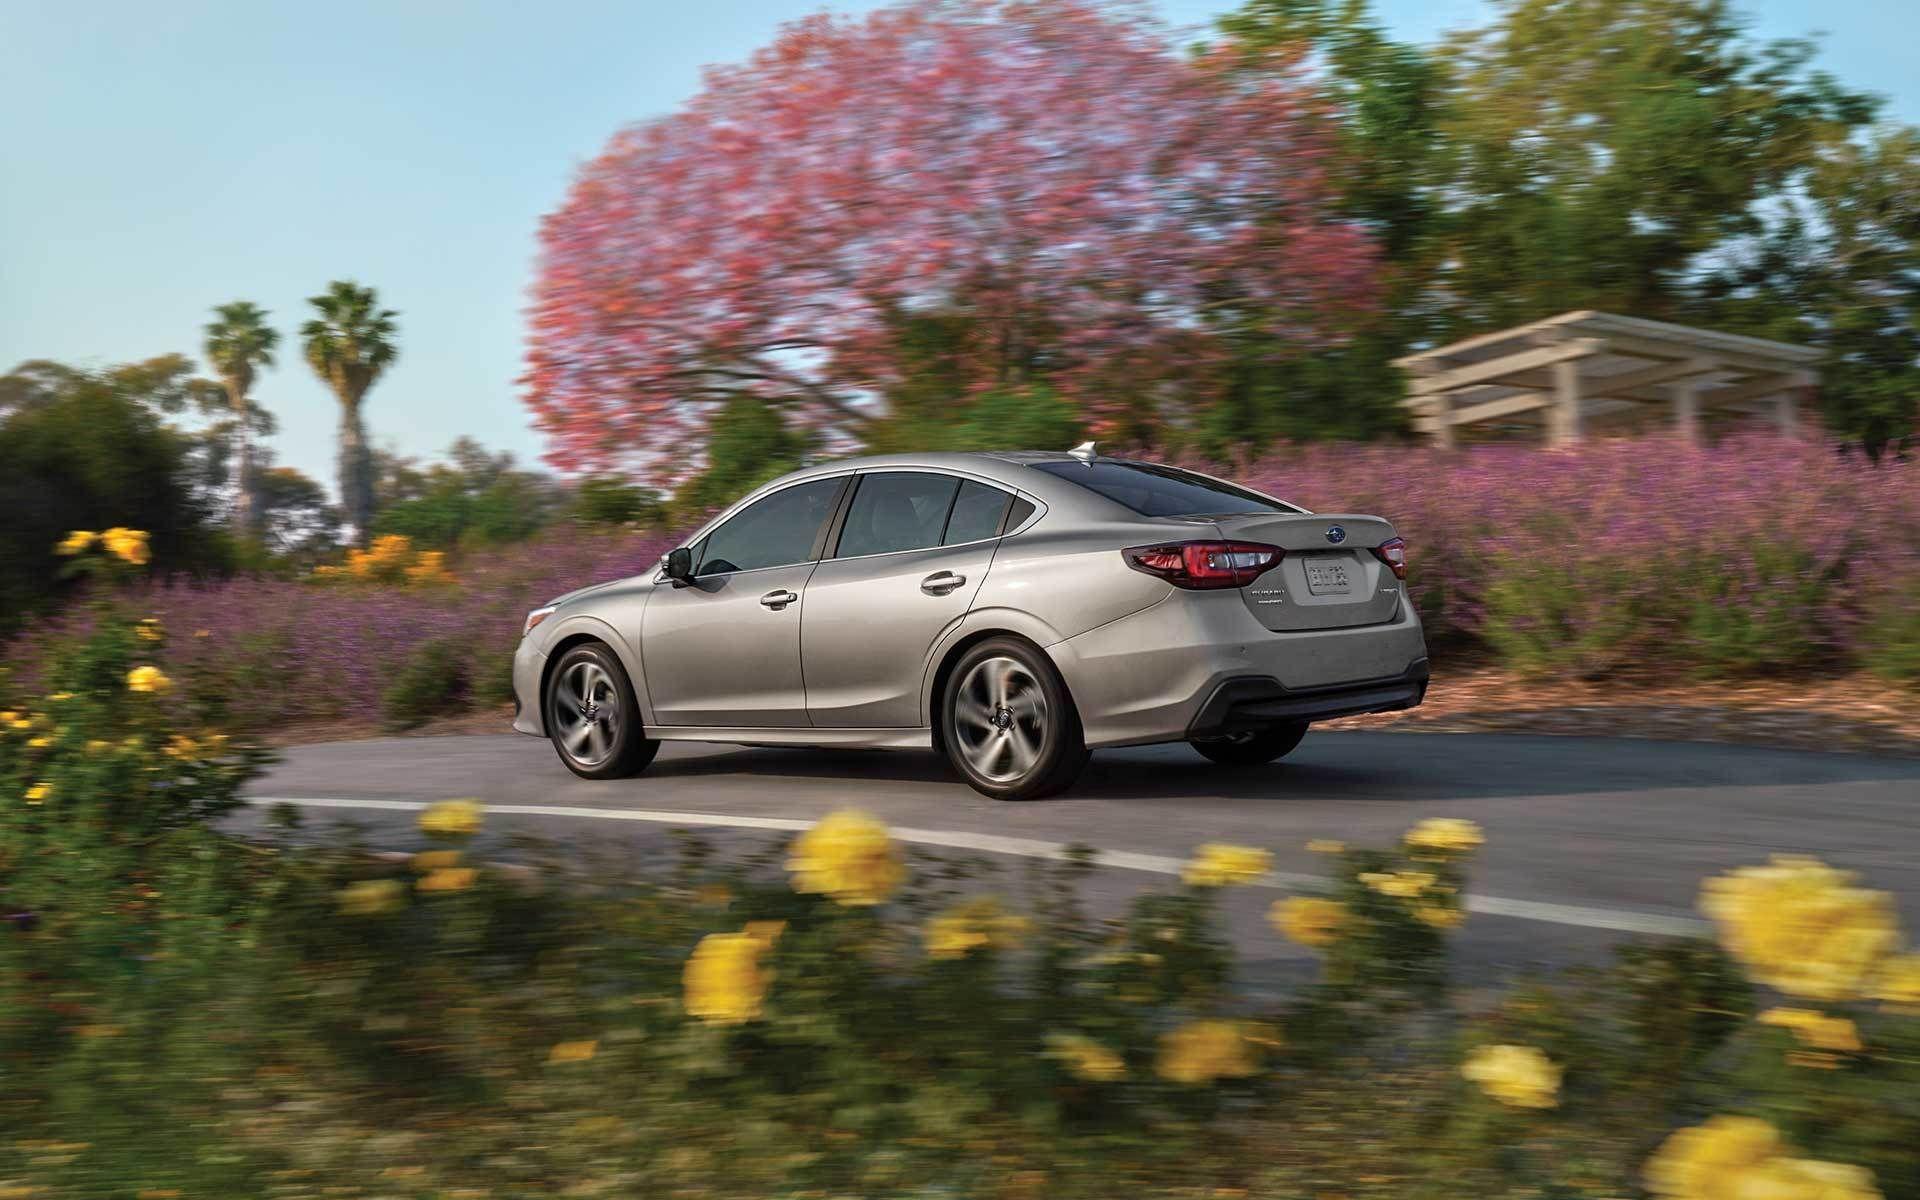 2020 Subaru Legacy in 2020 Subaru legacy, Legacy, Subaru